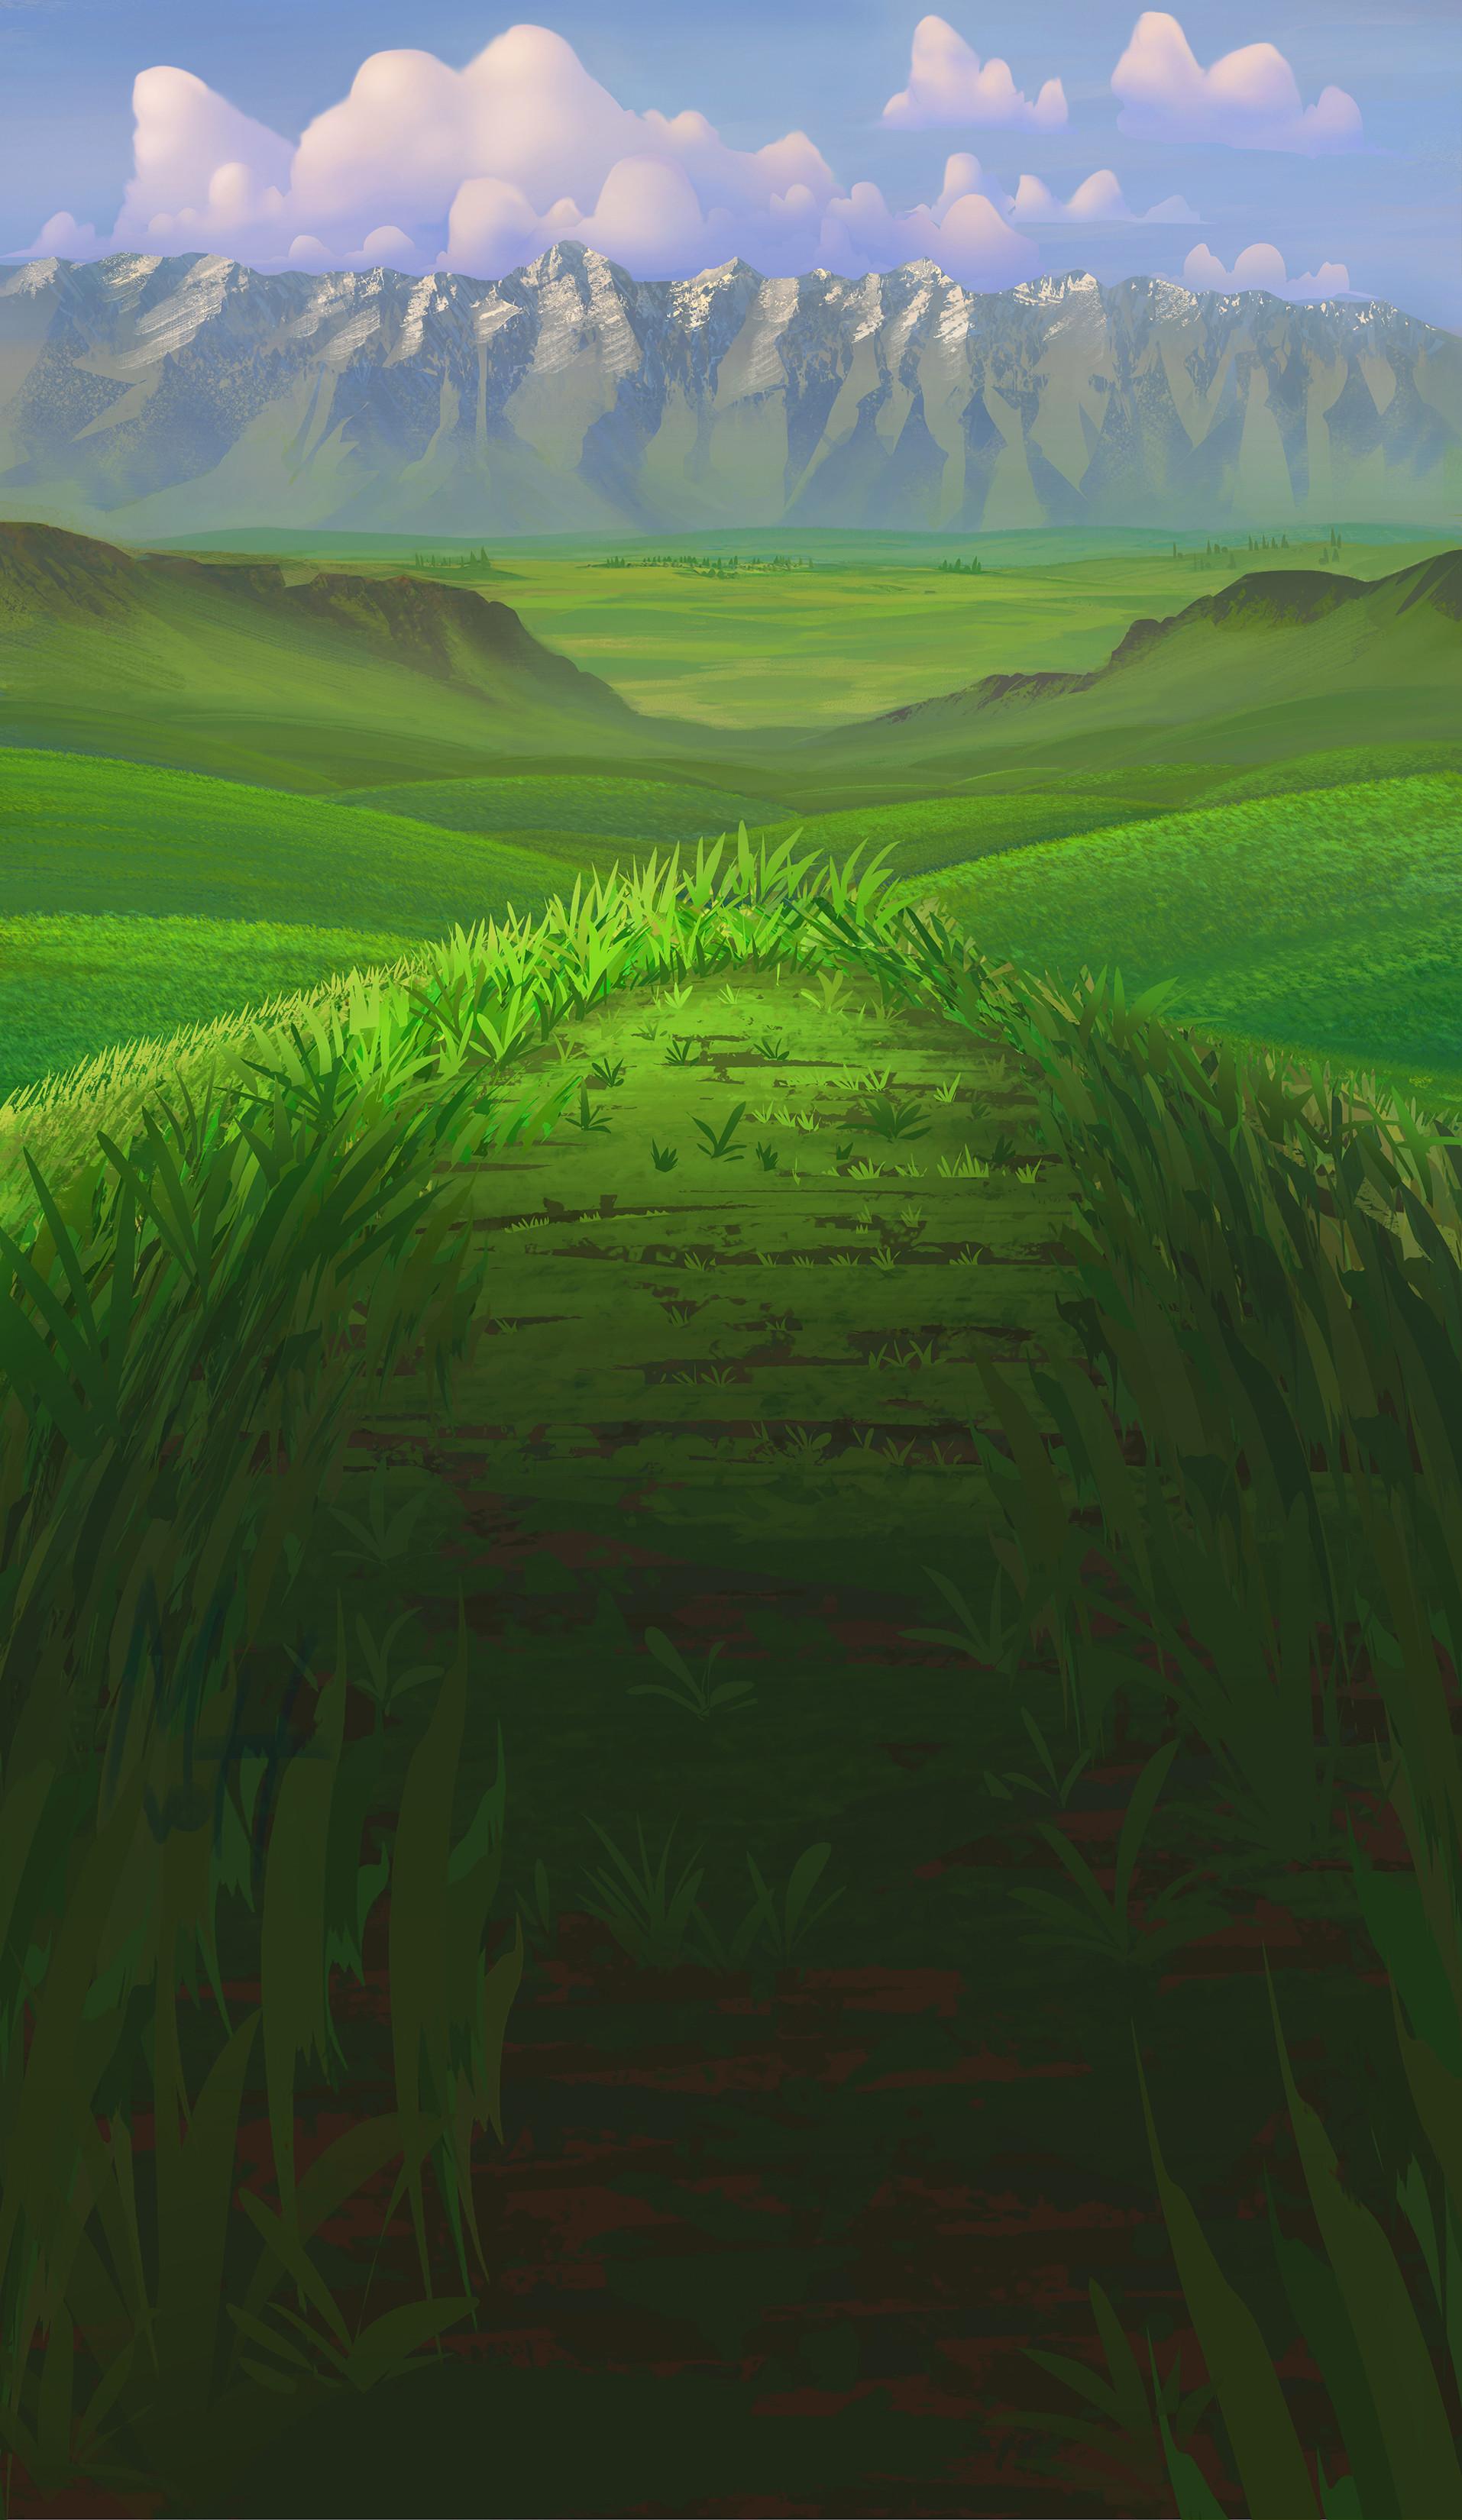 Michiel van den heuvel bgr grasslands michielvdheuvel